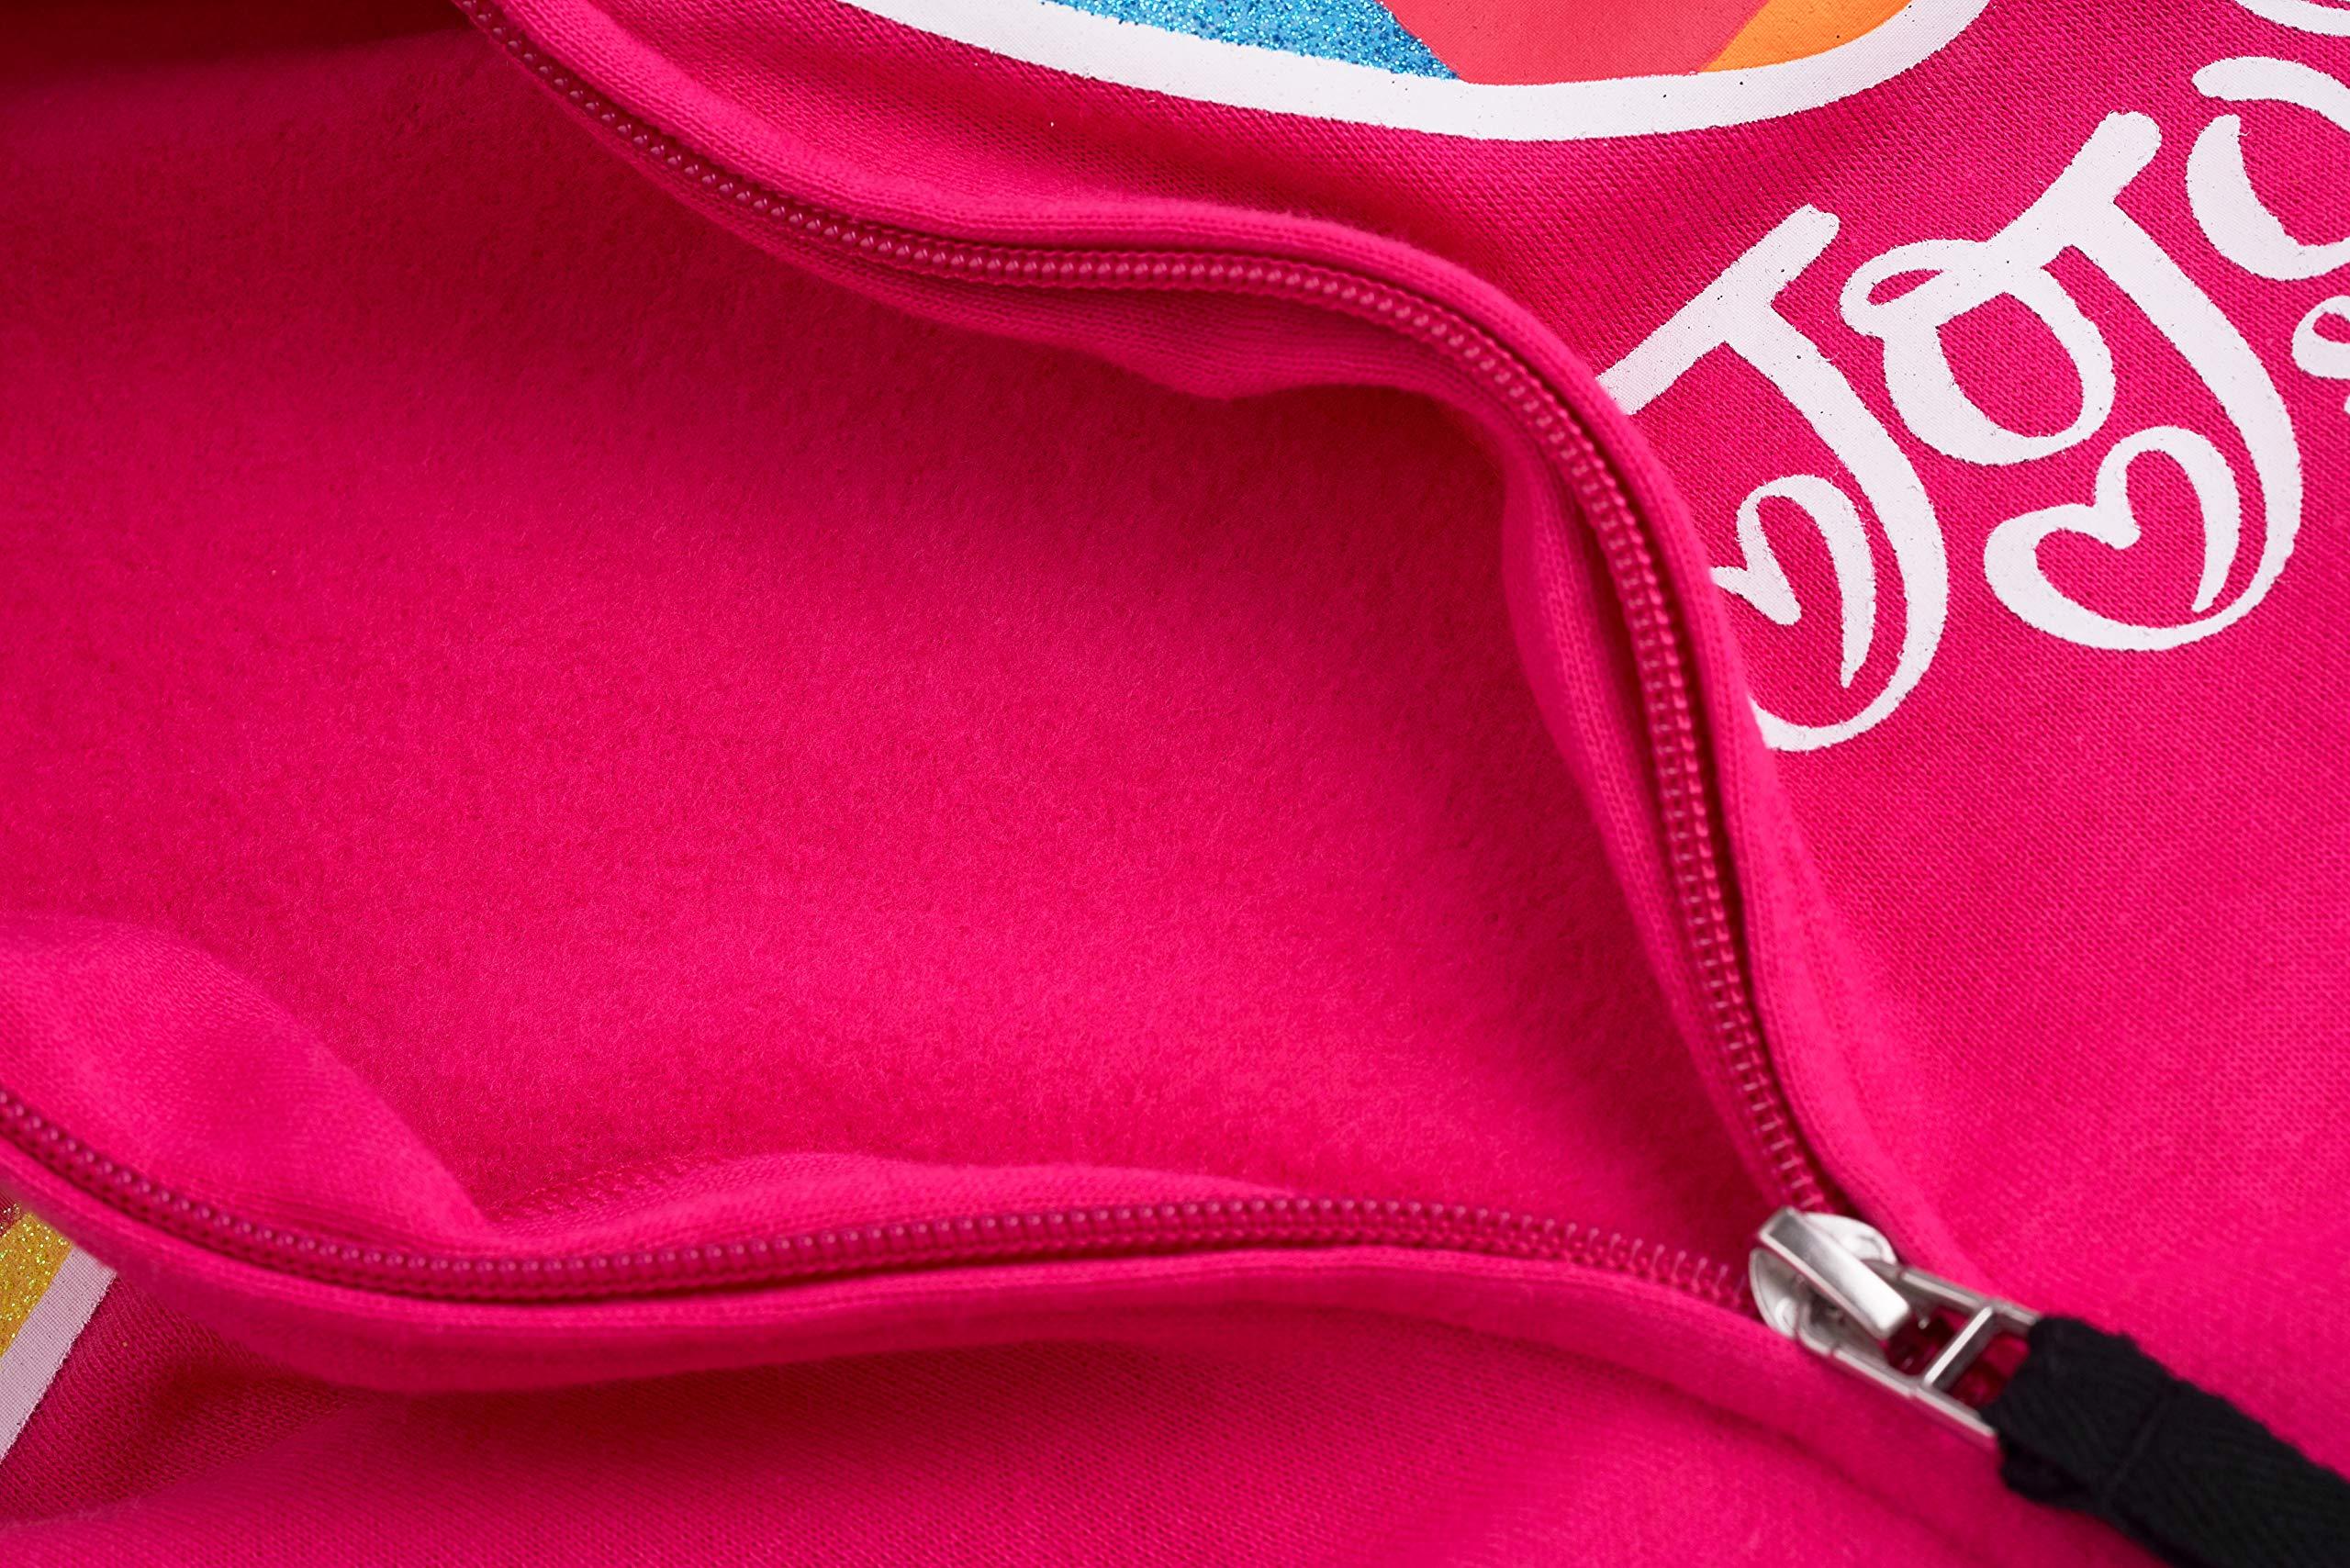 JoJo Siwa Girls' Little Big Bow Zip Up Athletic Hoodie, Red/Hot Pink, S-7 by JoJo Siwa (Image #2)